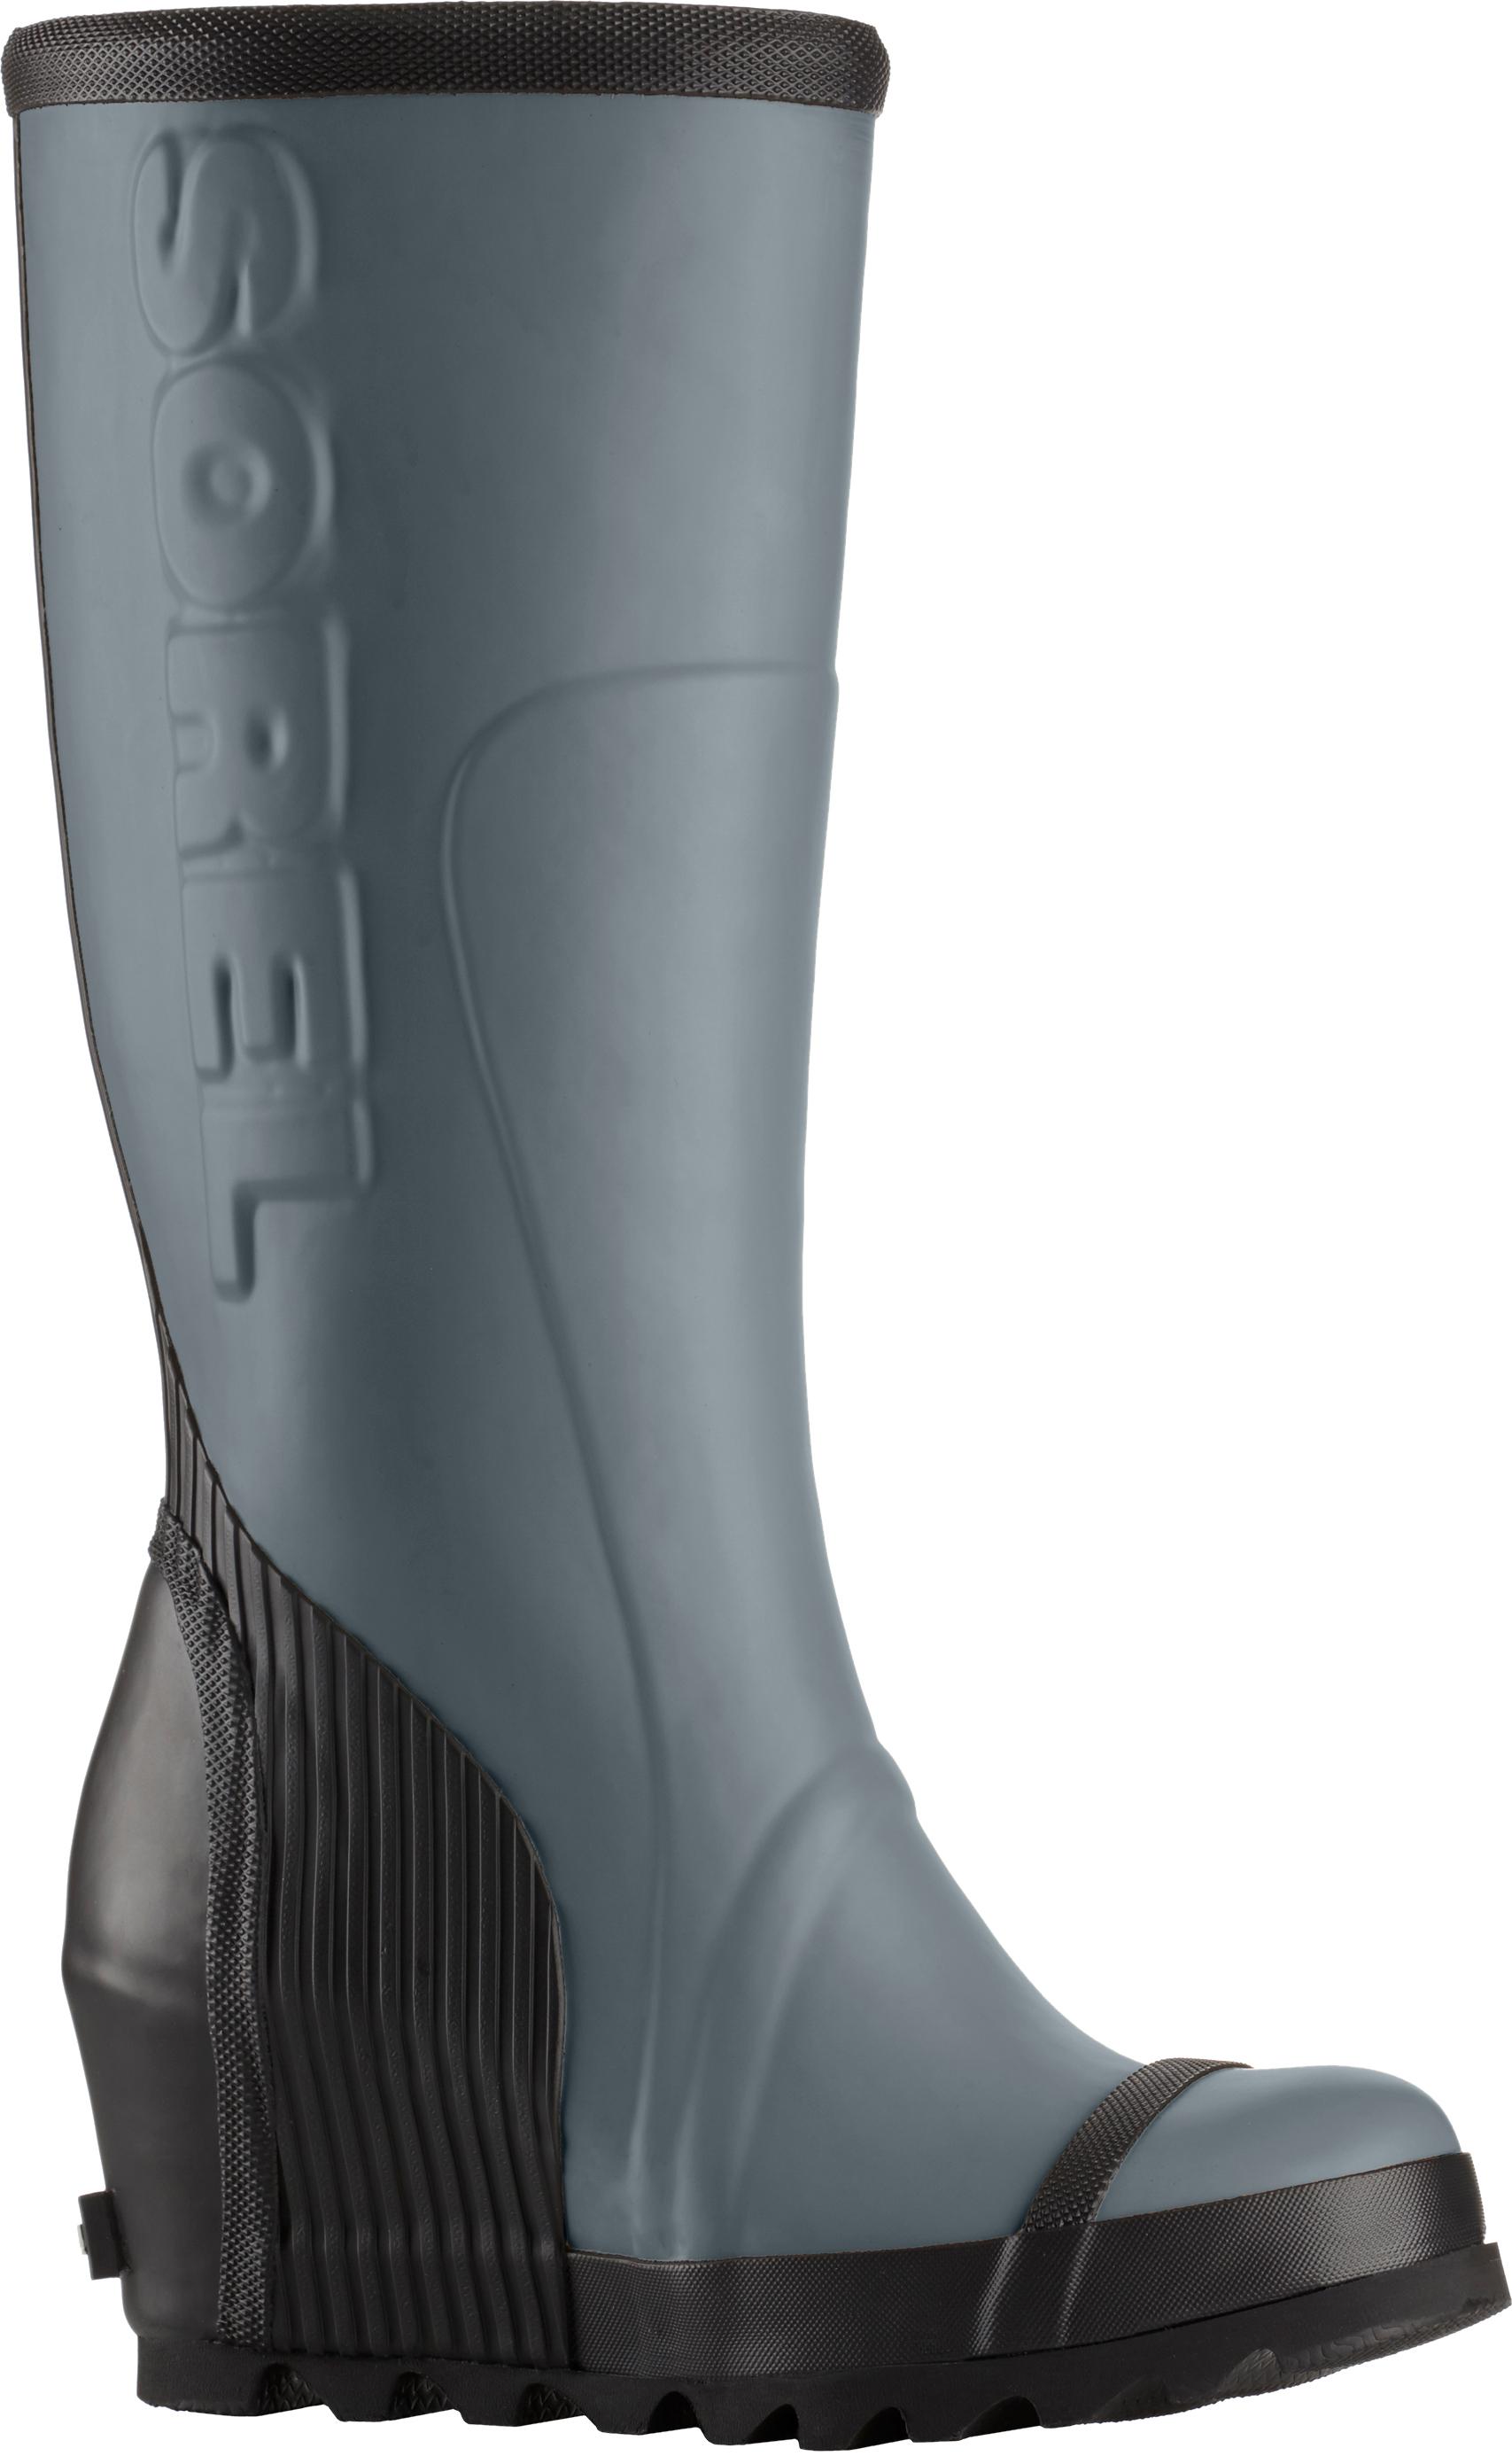 83a82bae950 Sorel Joan Rain Wedge Tall Felt Rubber Boot - Women s